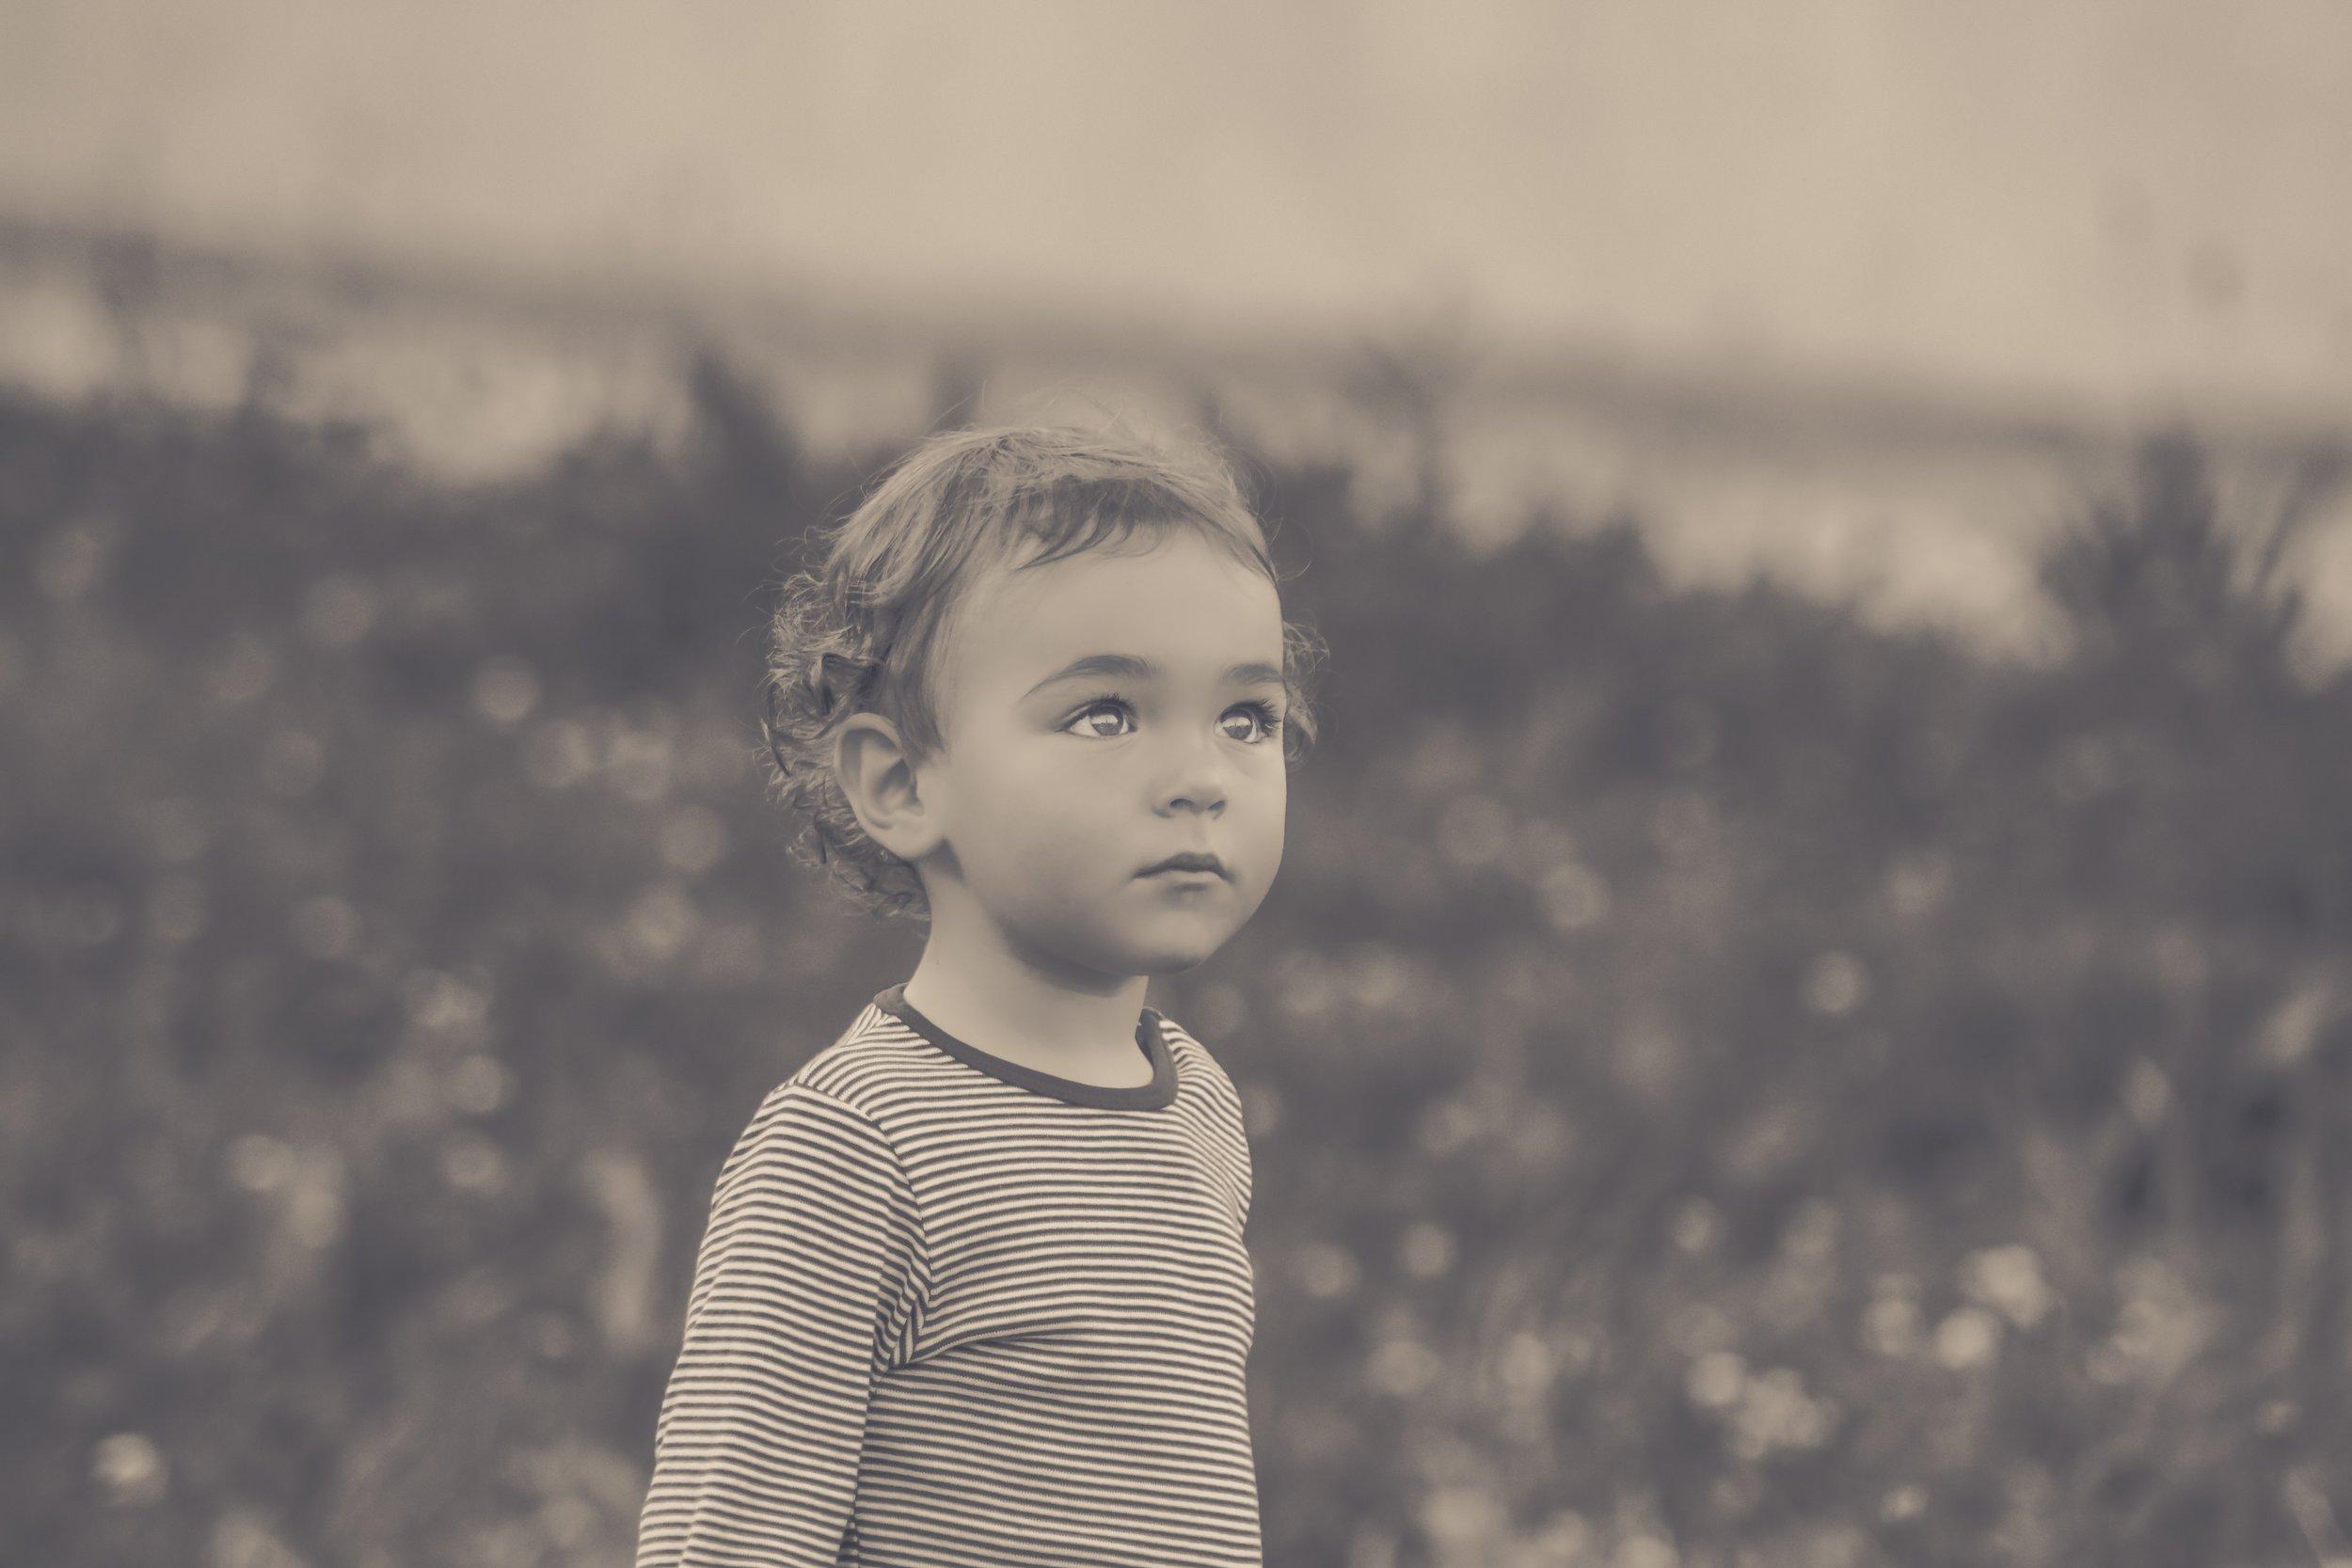 black-and-white-boy-child-277325.jpg